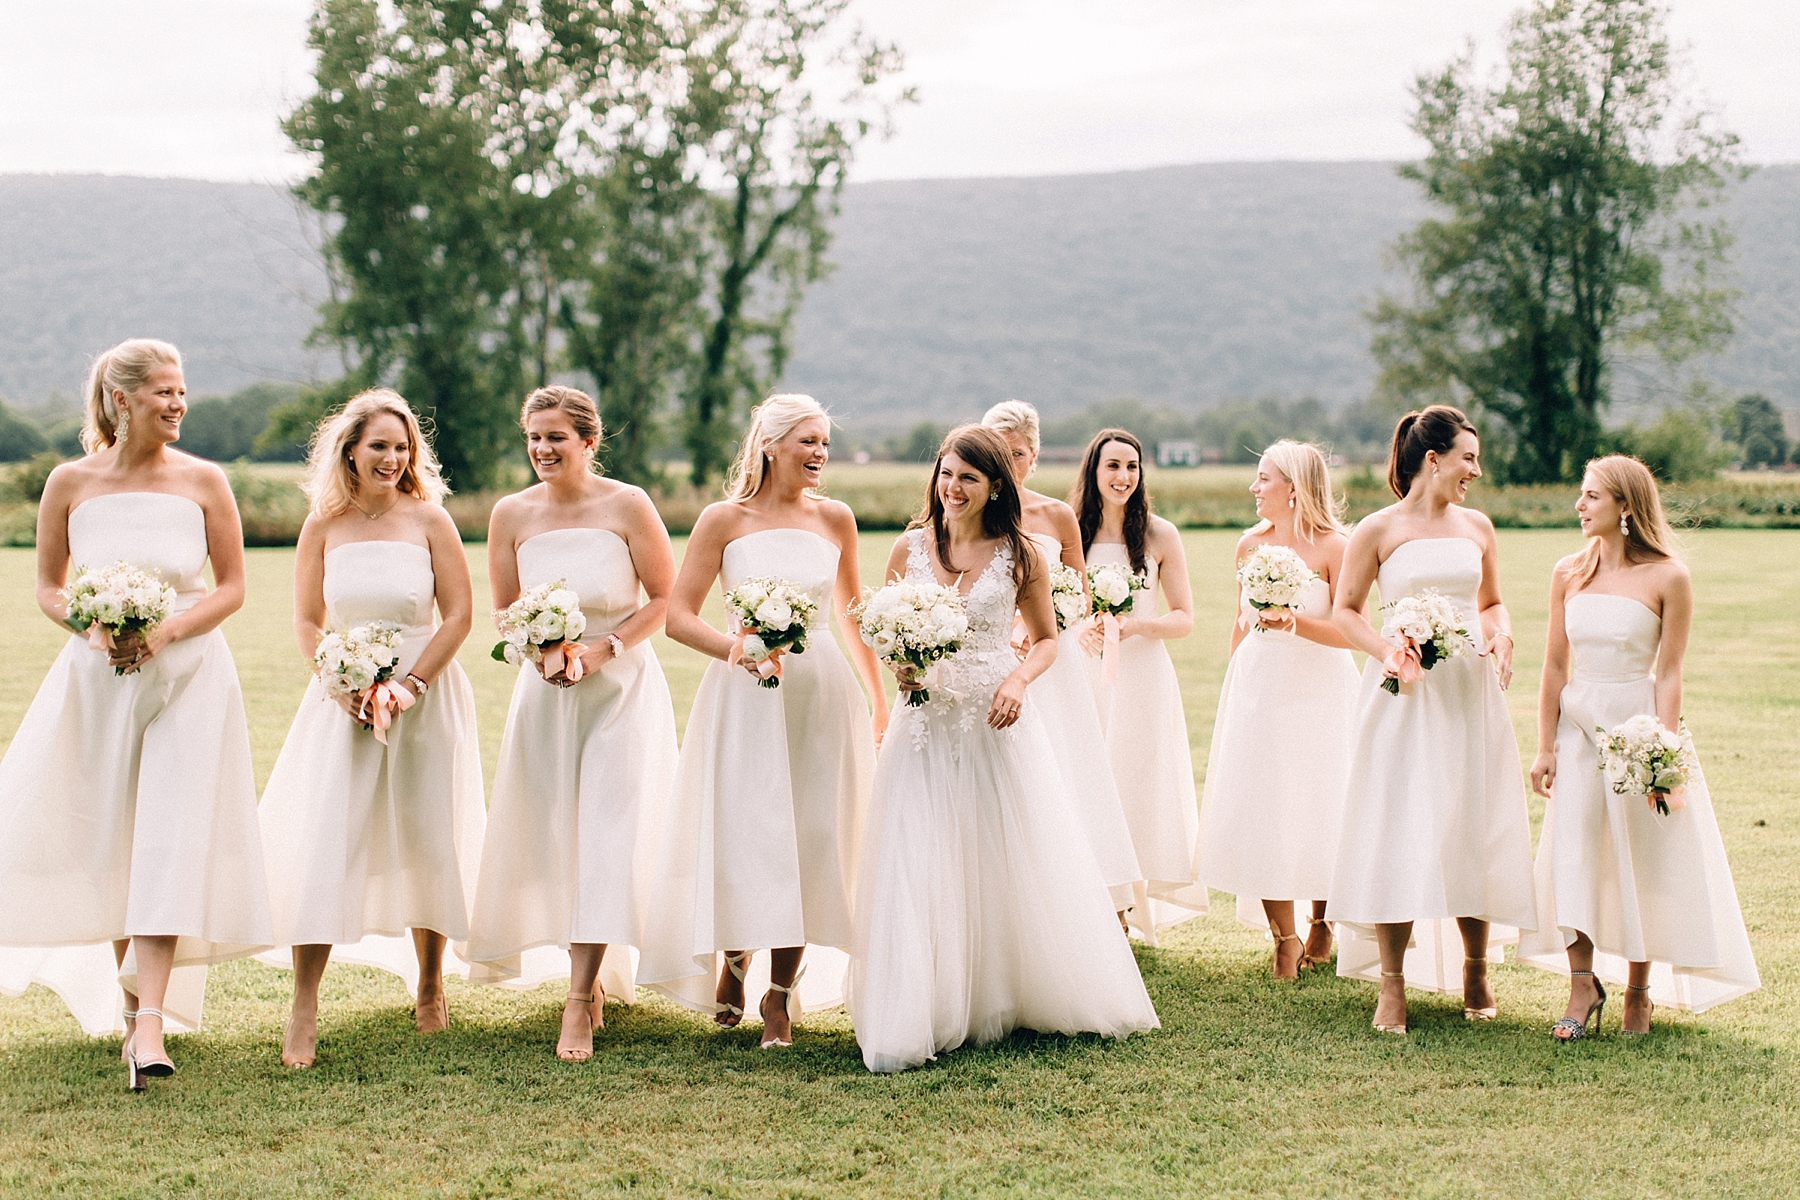 mashomack-preserve-polo-club-wedding-ny-photographer_0056.jpg